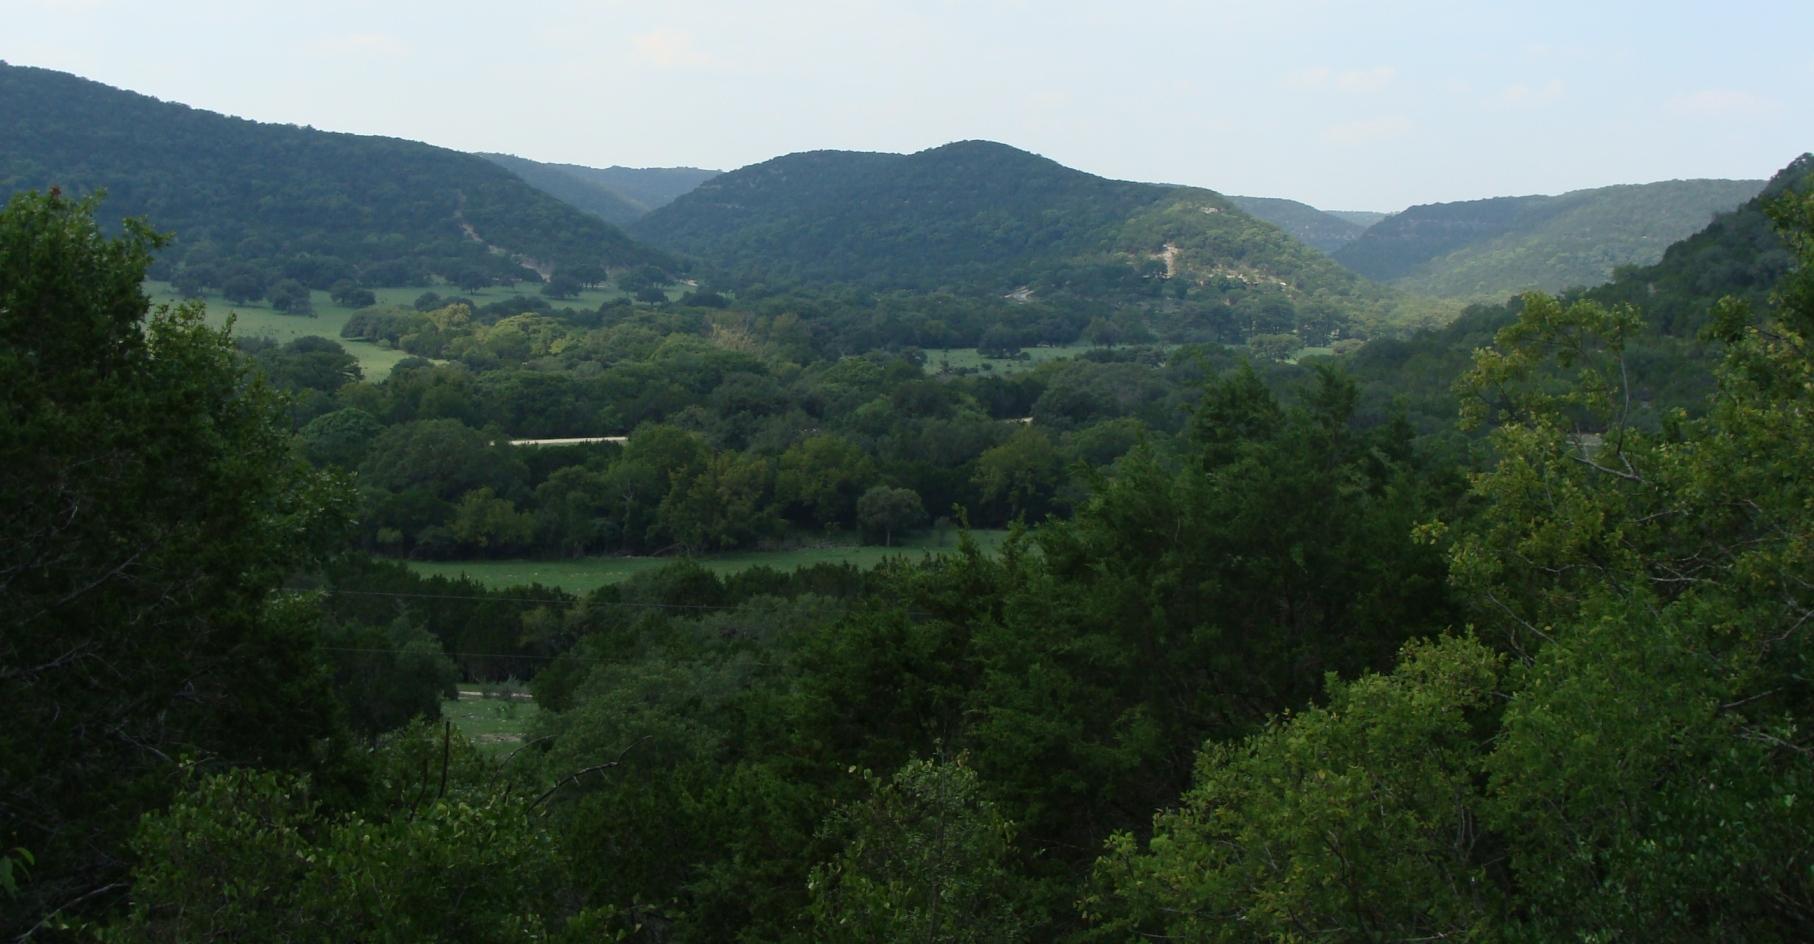 FileTexas Hill Country 187NJPG  Wikimedia Commons